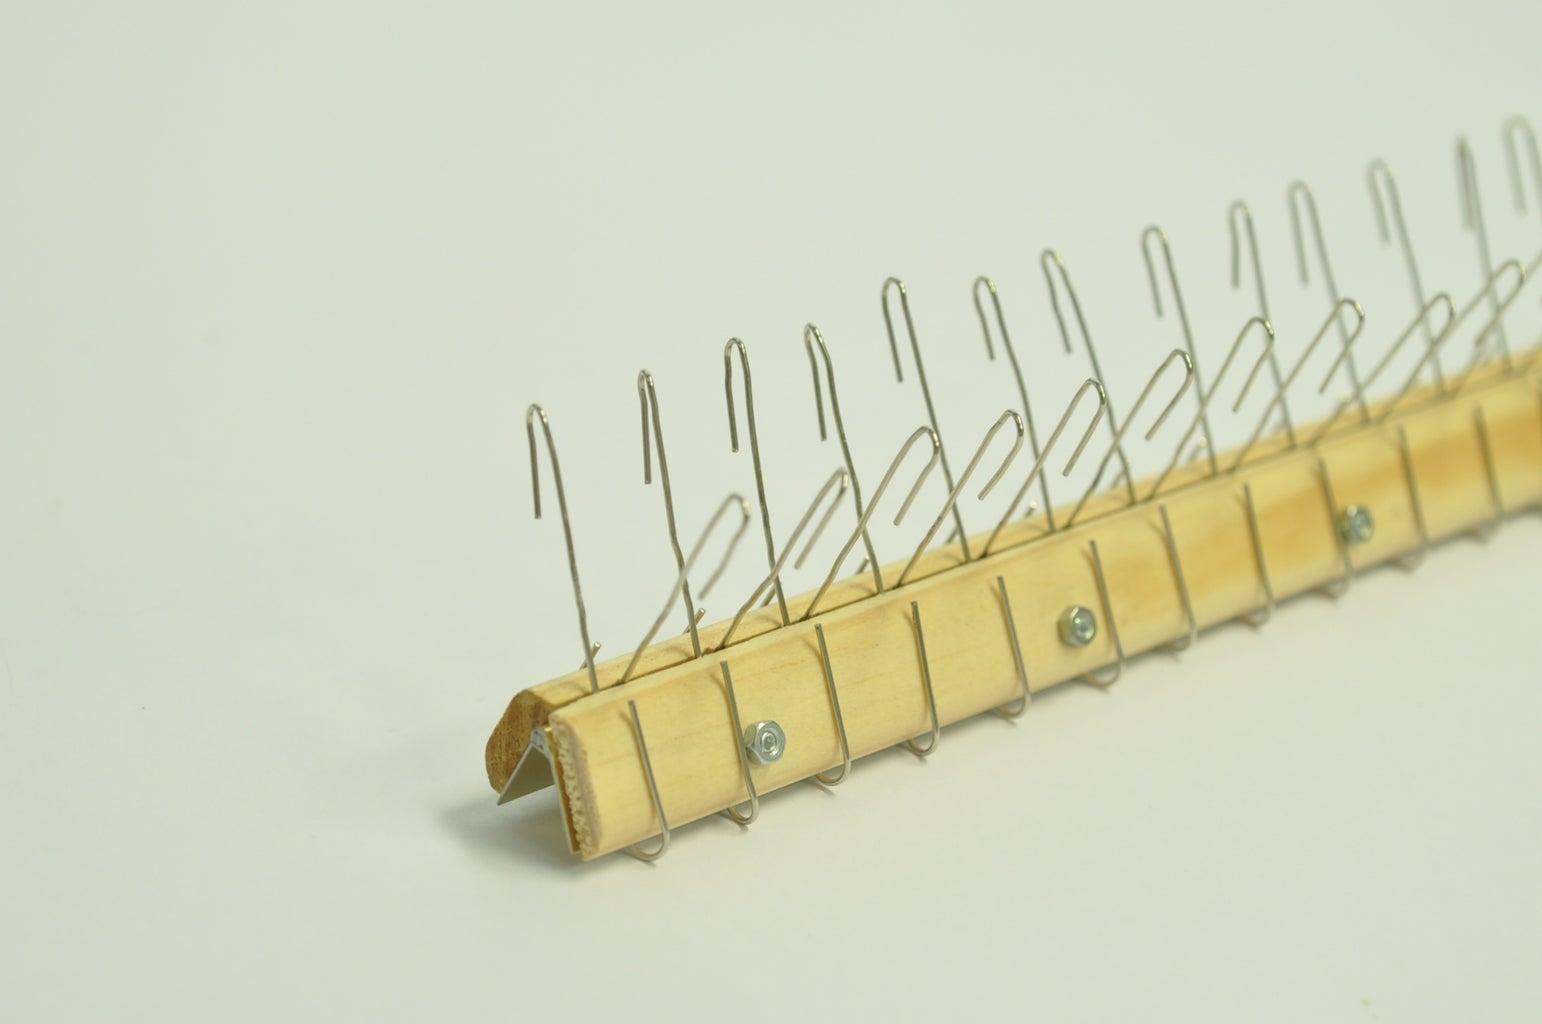 Assemble the Comb